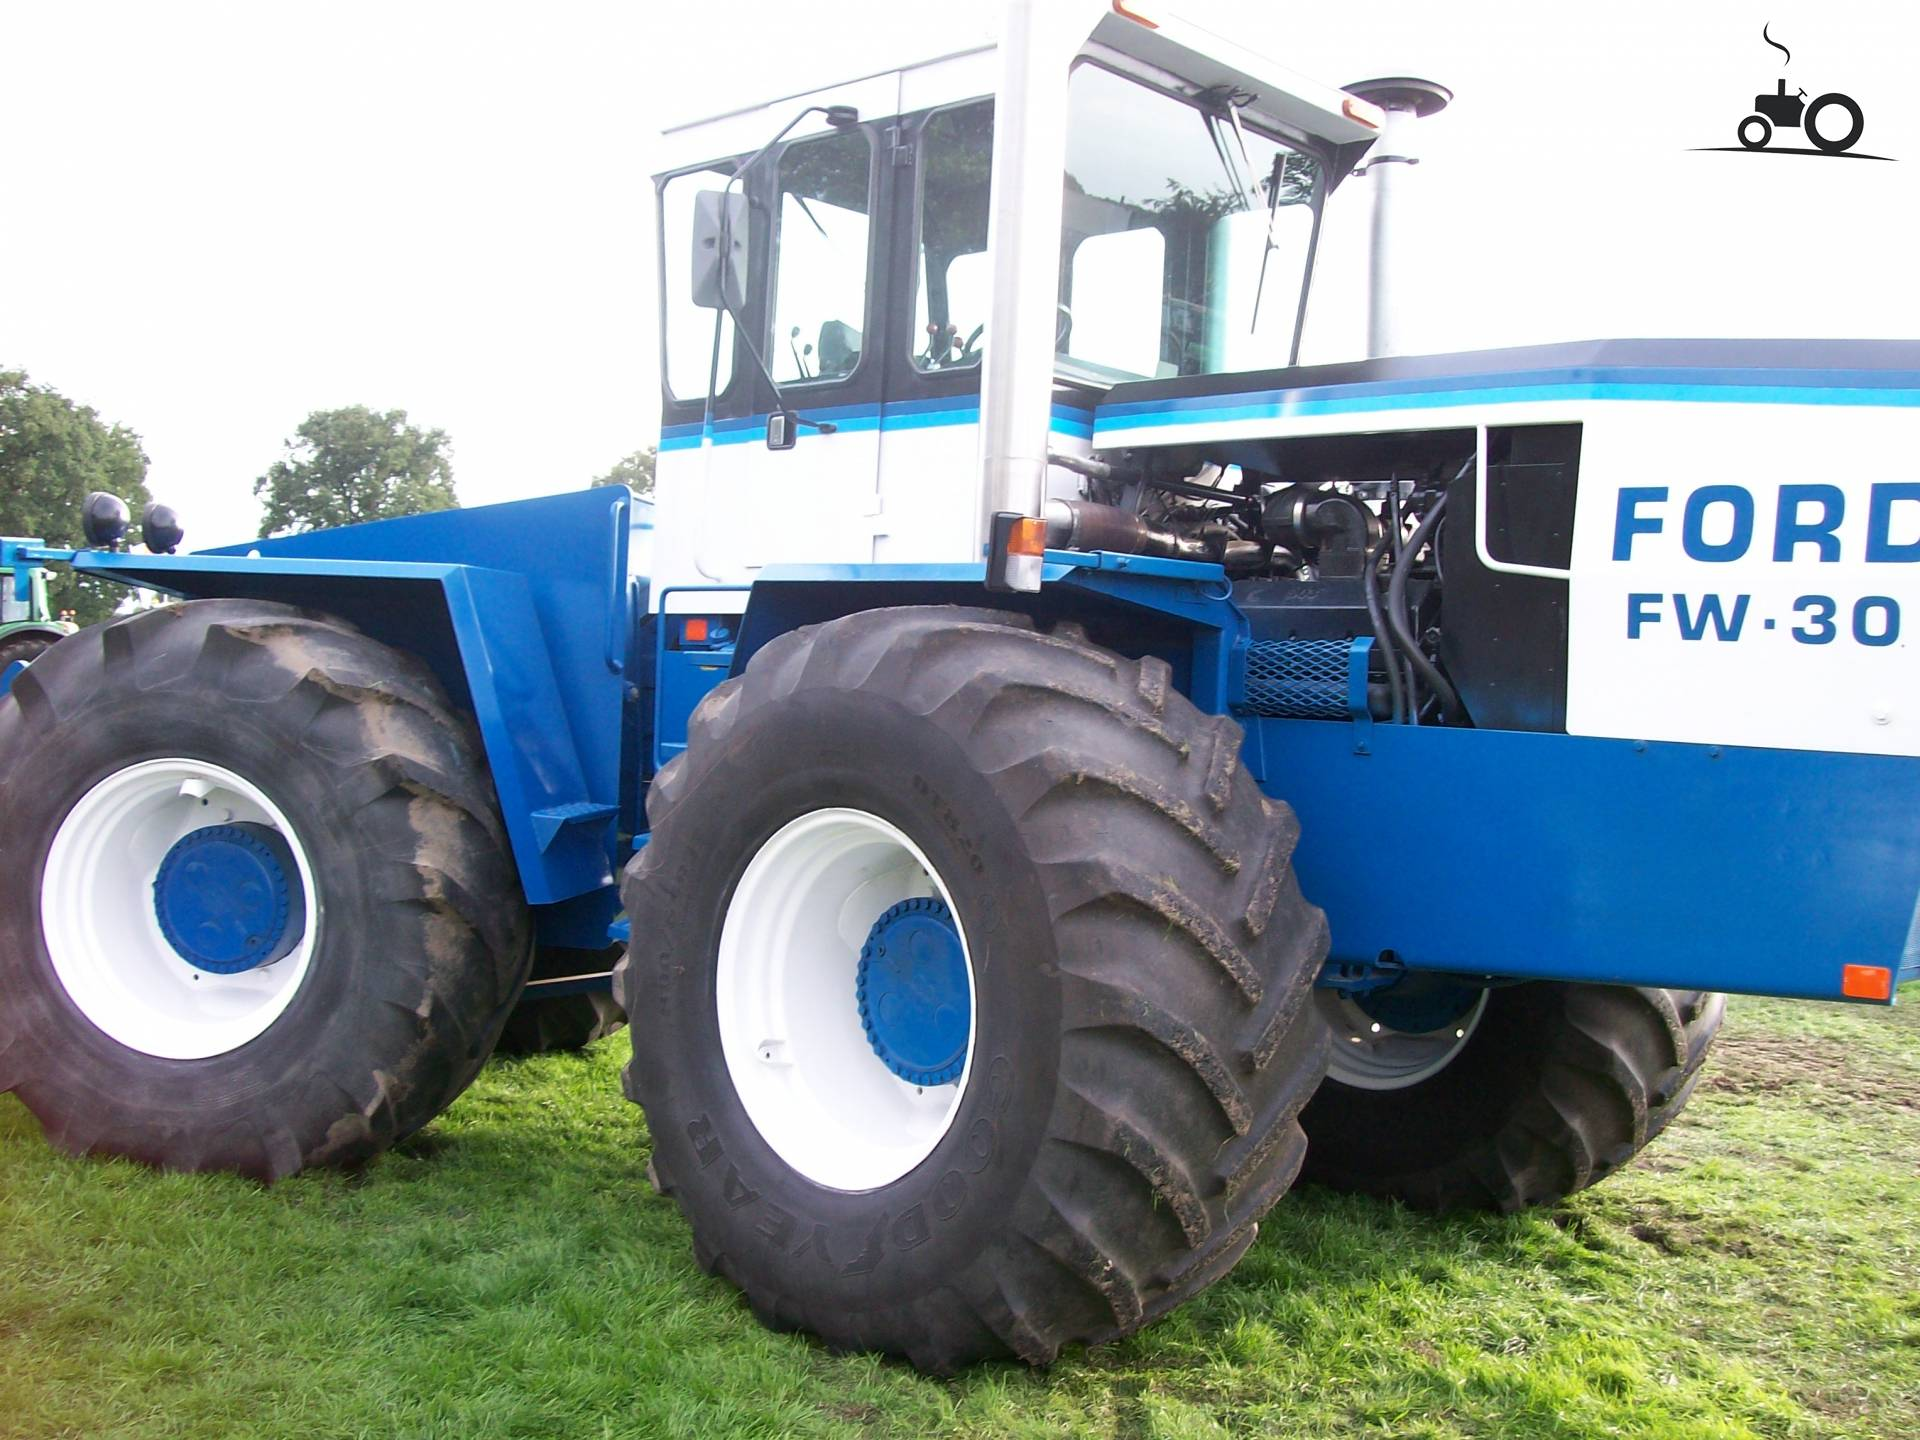 Big Ford Tractors : Foto ford fw